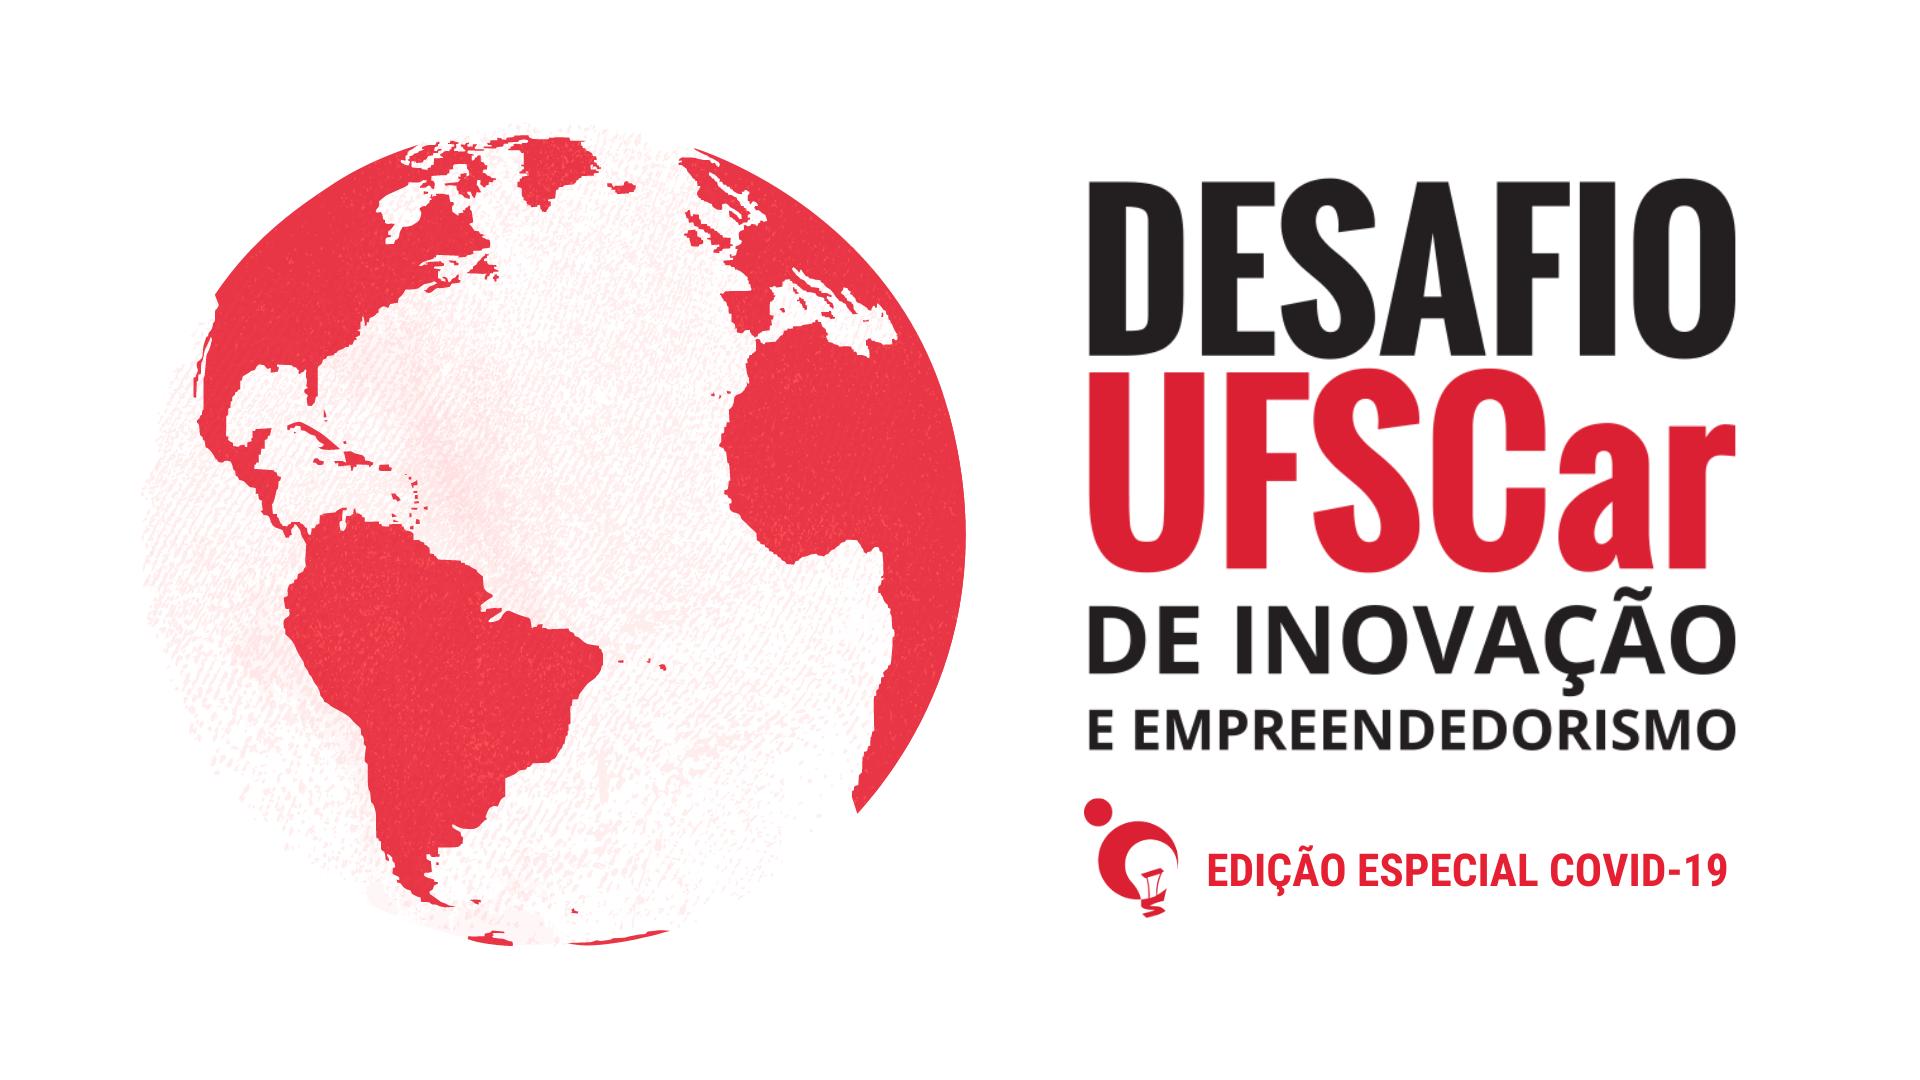 2º Desafio UFSCar premia projeto de atendimentos a vítimas de violência